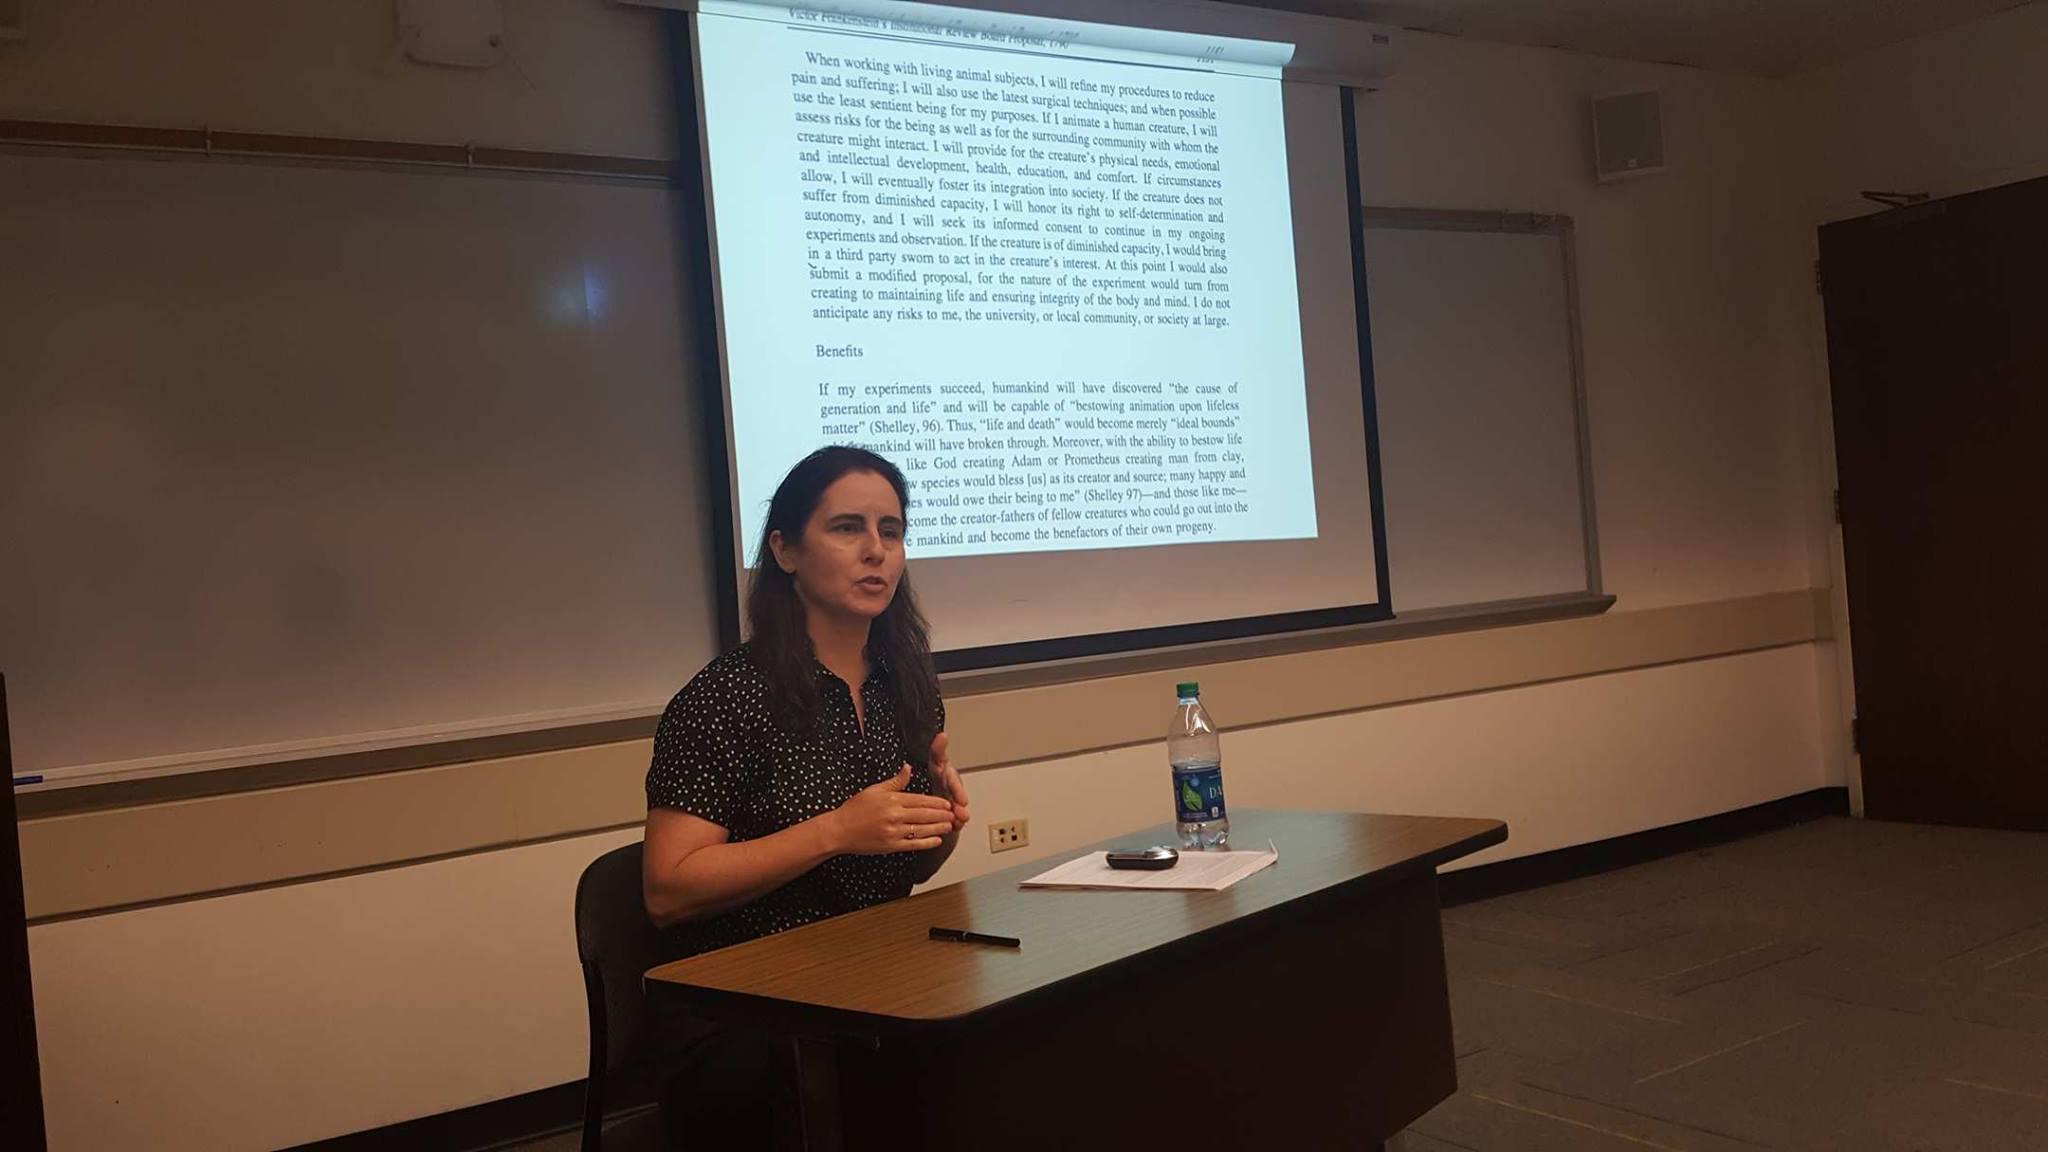 Danielle Spencer, Ph.D. in American Studies, Faculty Member of the Program in Narrative Medicine at Columbia University